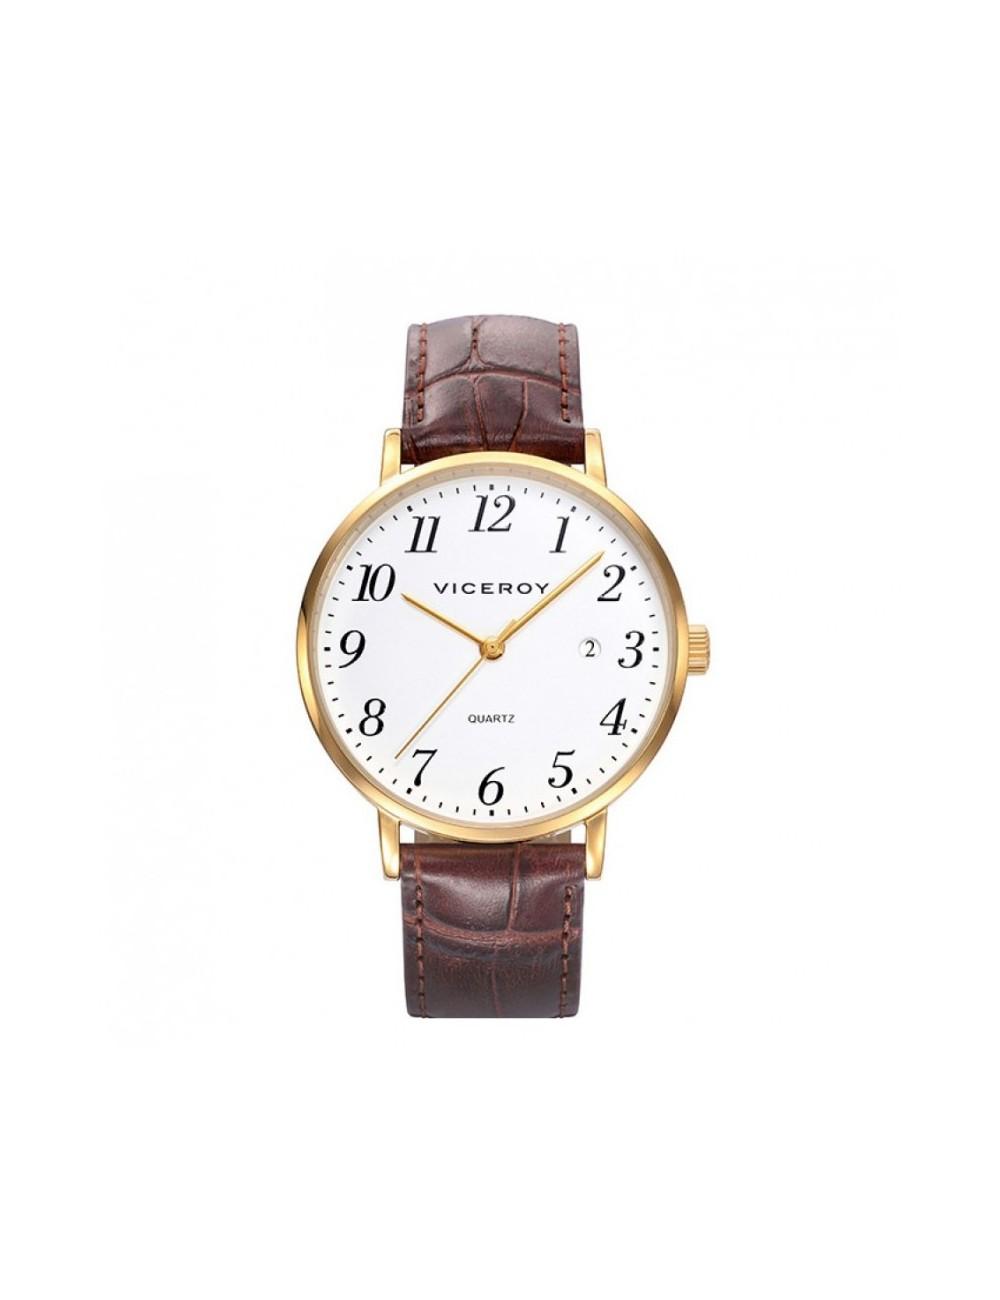 fdbaf55075a3 Viceroy reloj Classic 38mm dorado piel. Loading zoom